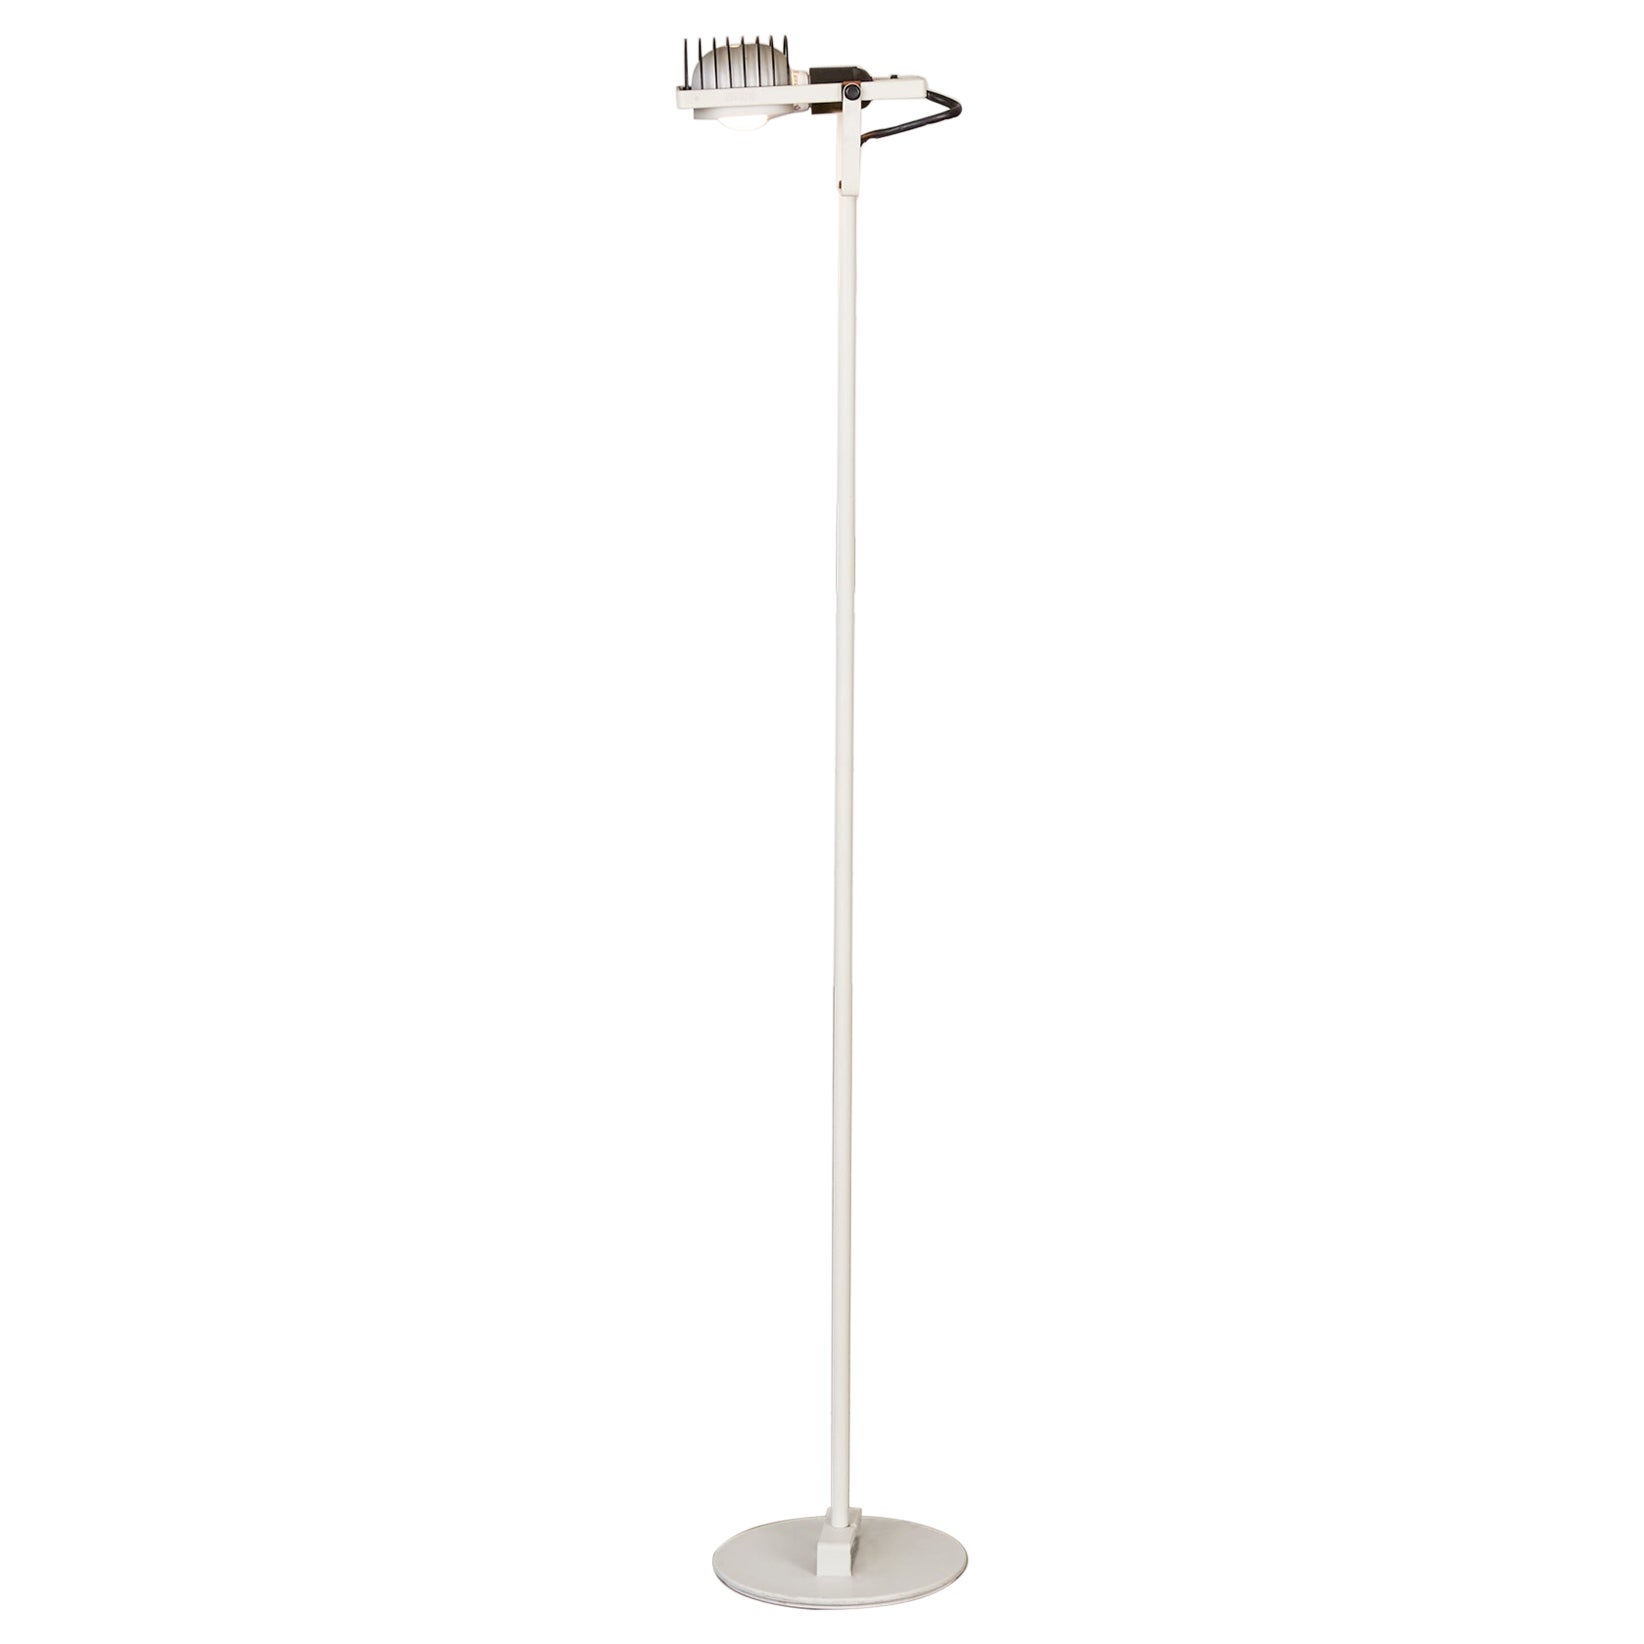 "Ernesto Gismondi ""Sintesi"" Floor Lamp for Artemide"